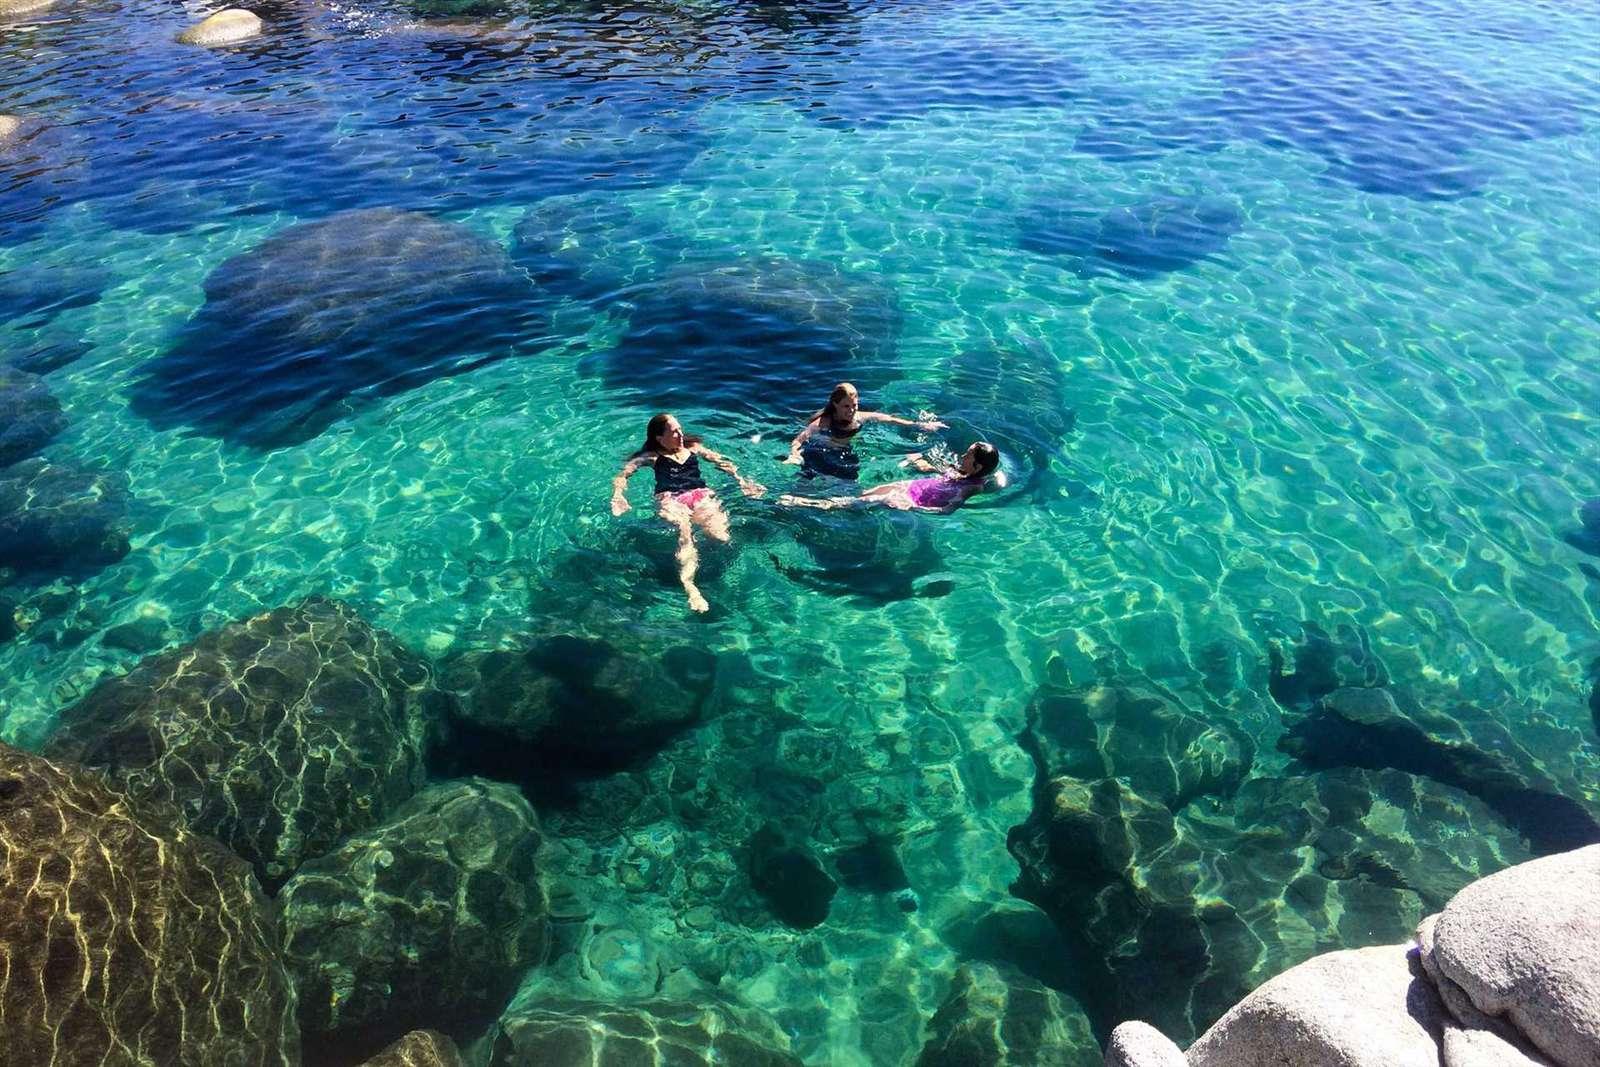 Swimming in Lake Tahoe